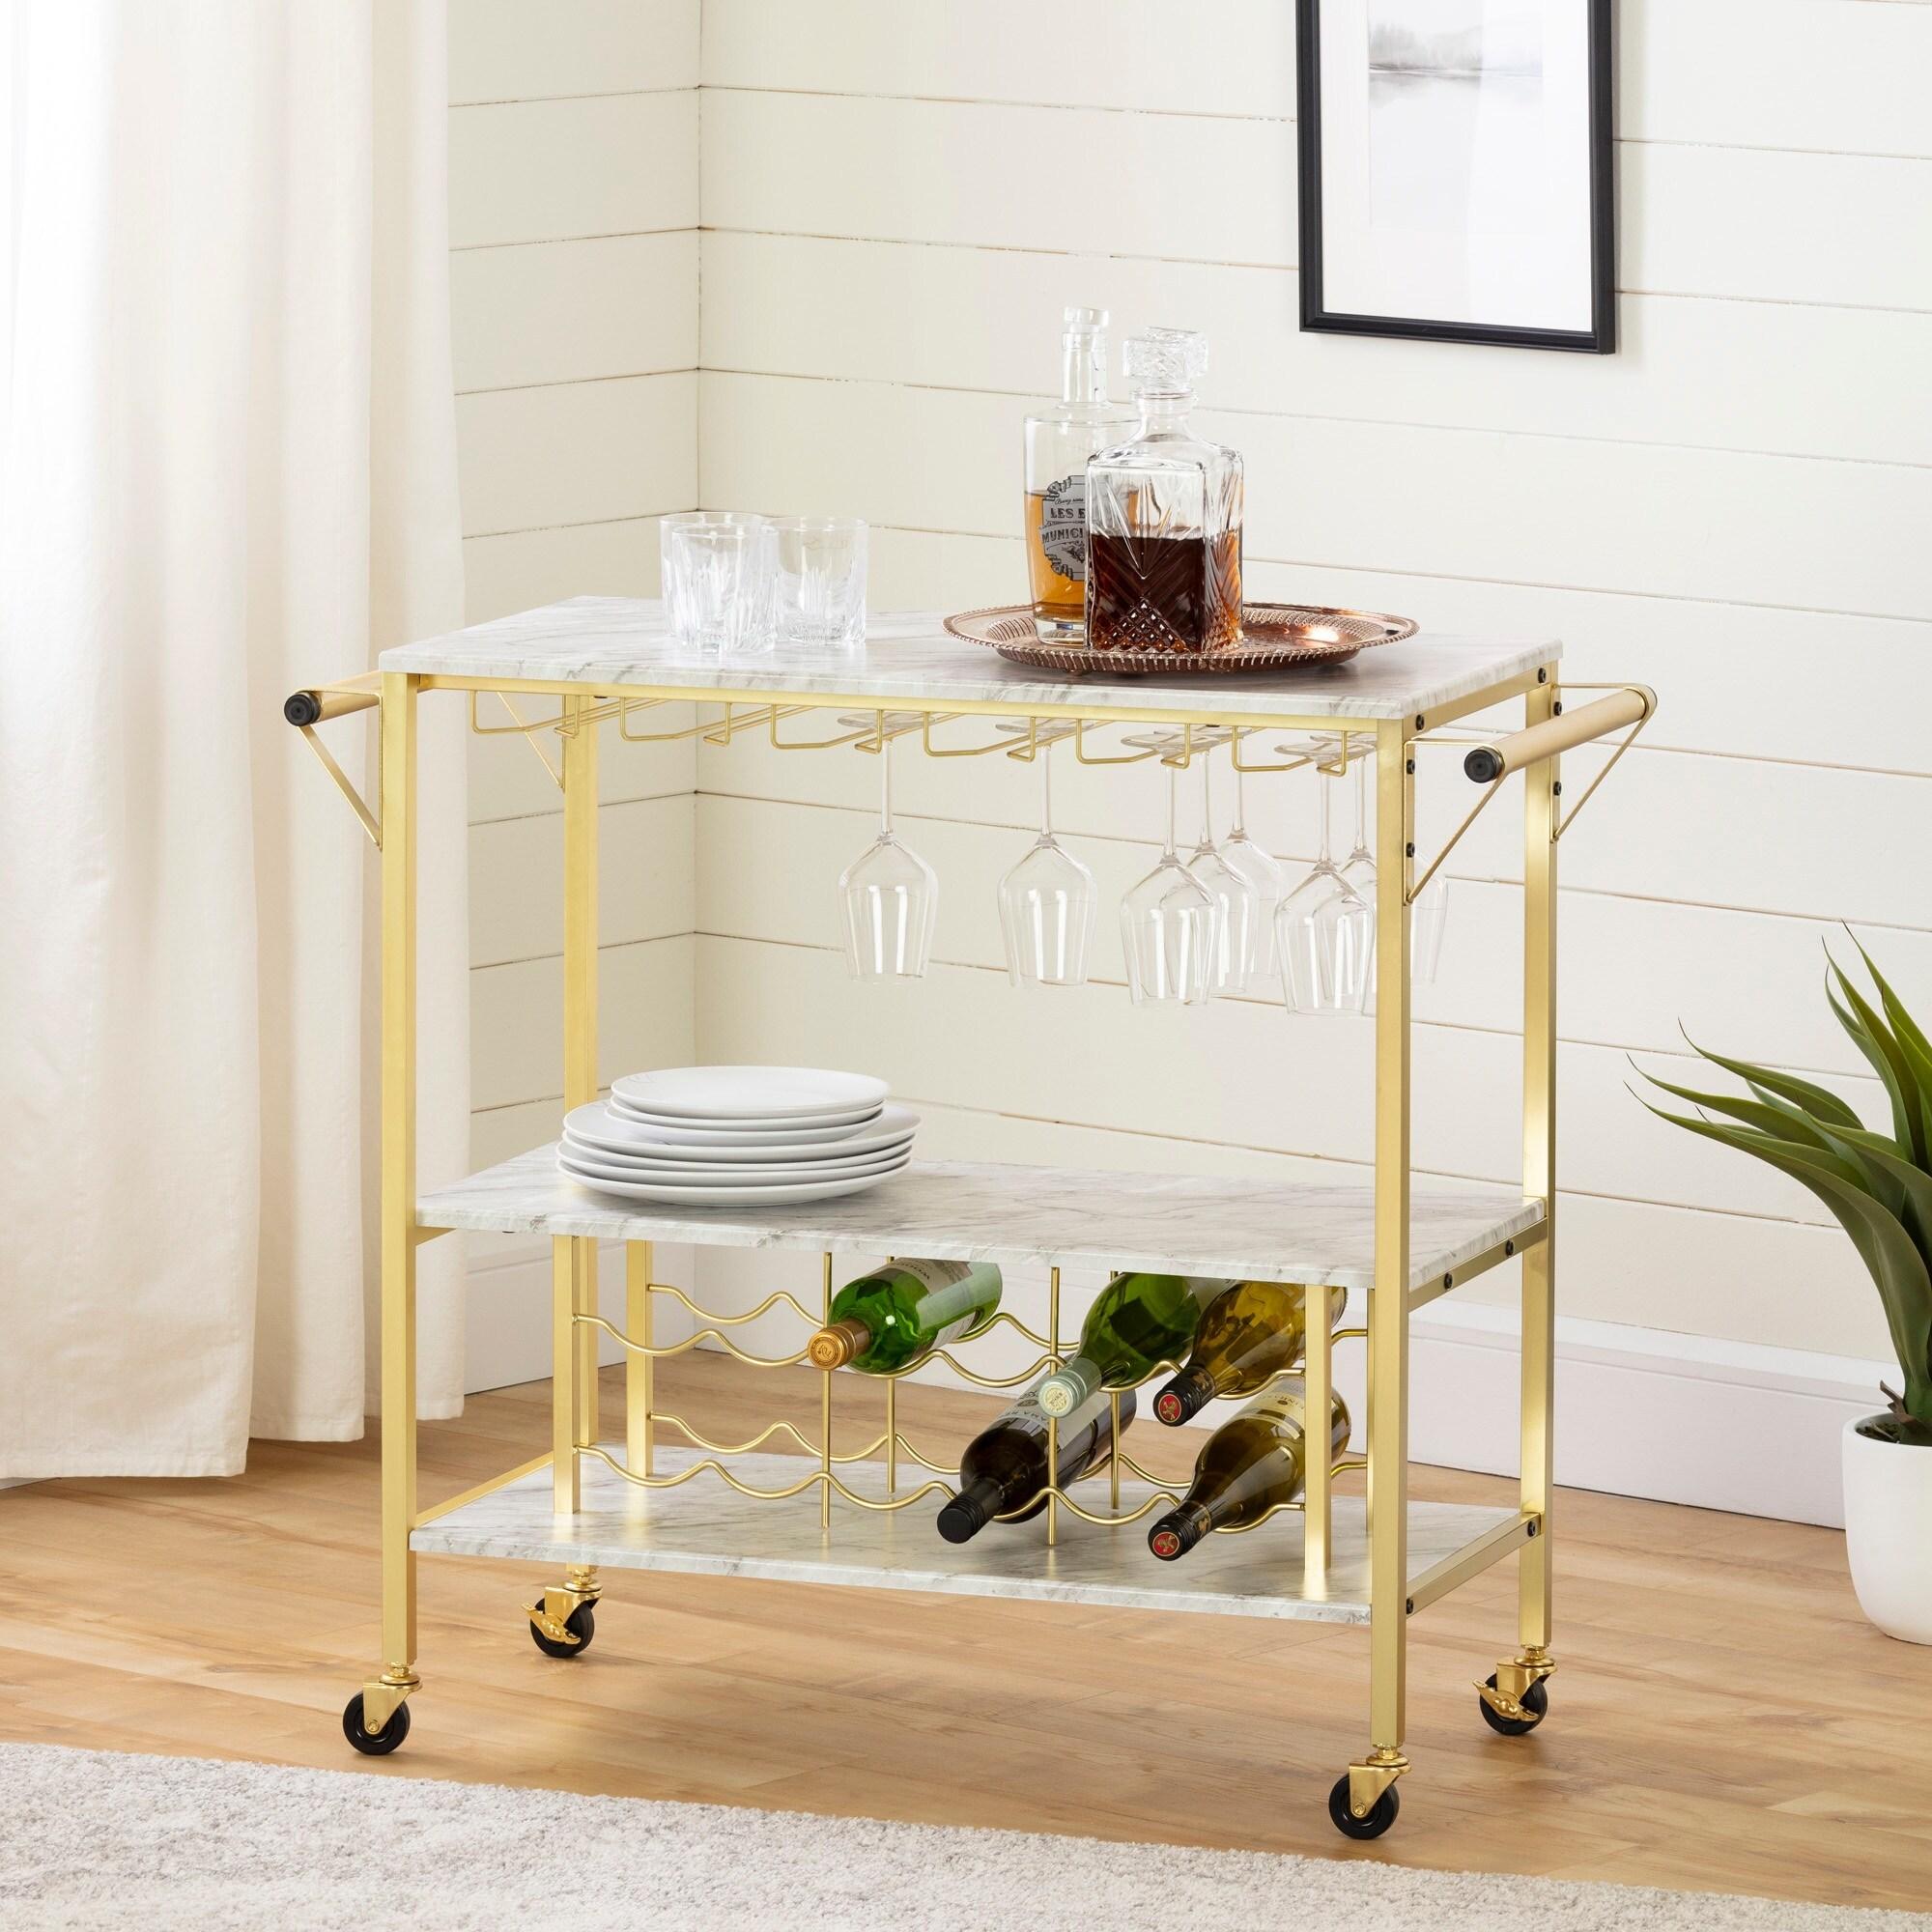 south shore maliza bar cart w wine bottle storage glass rack